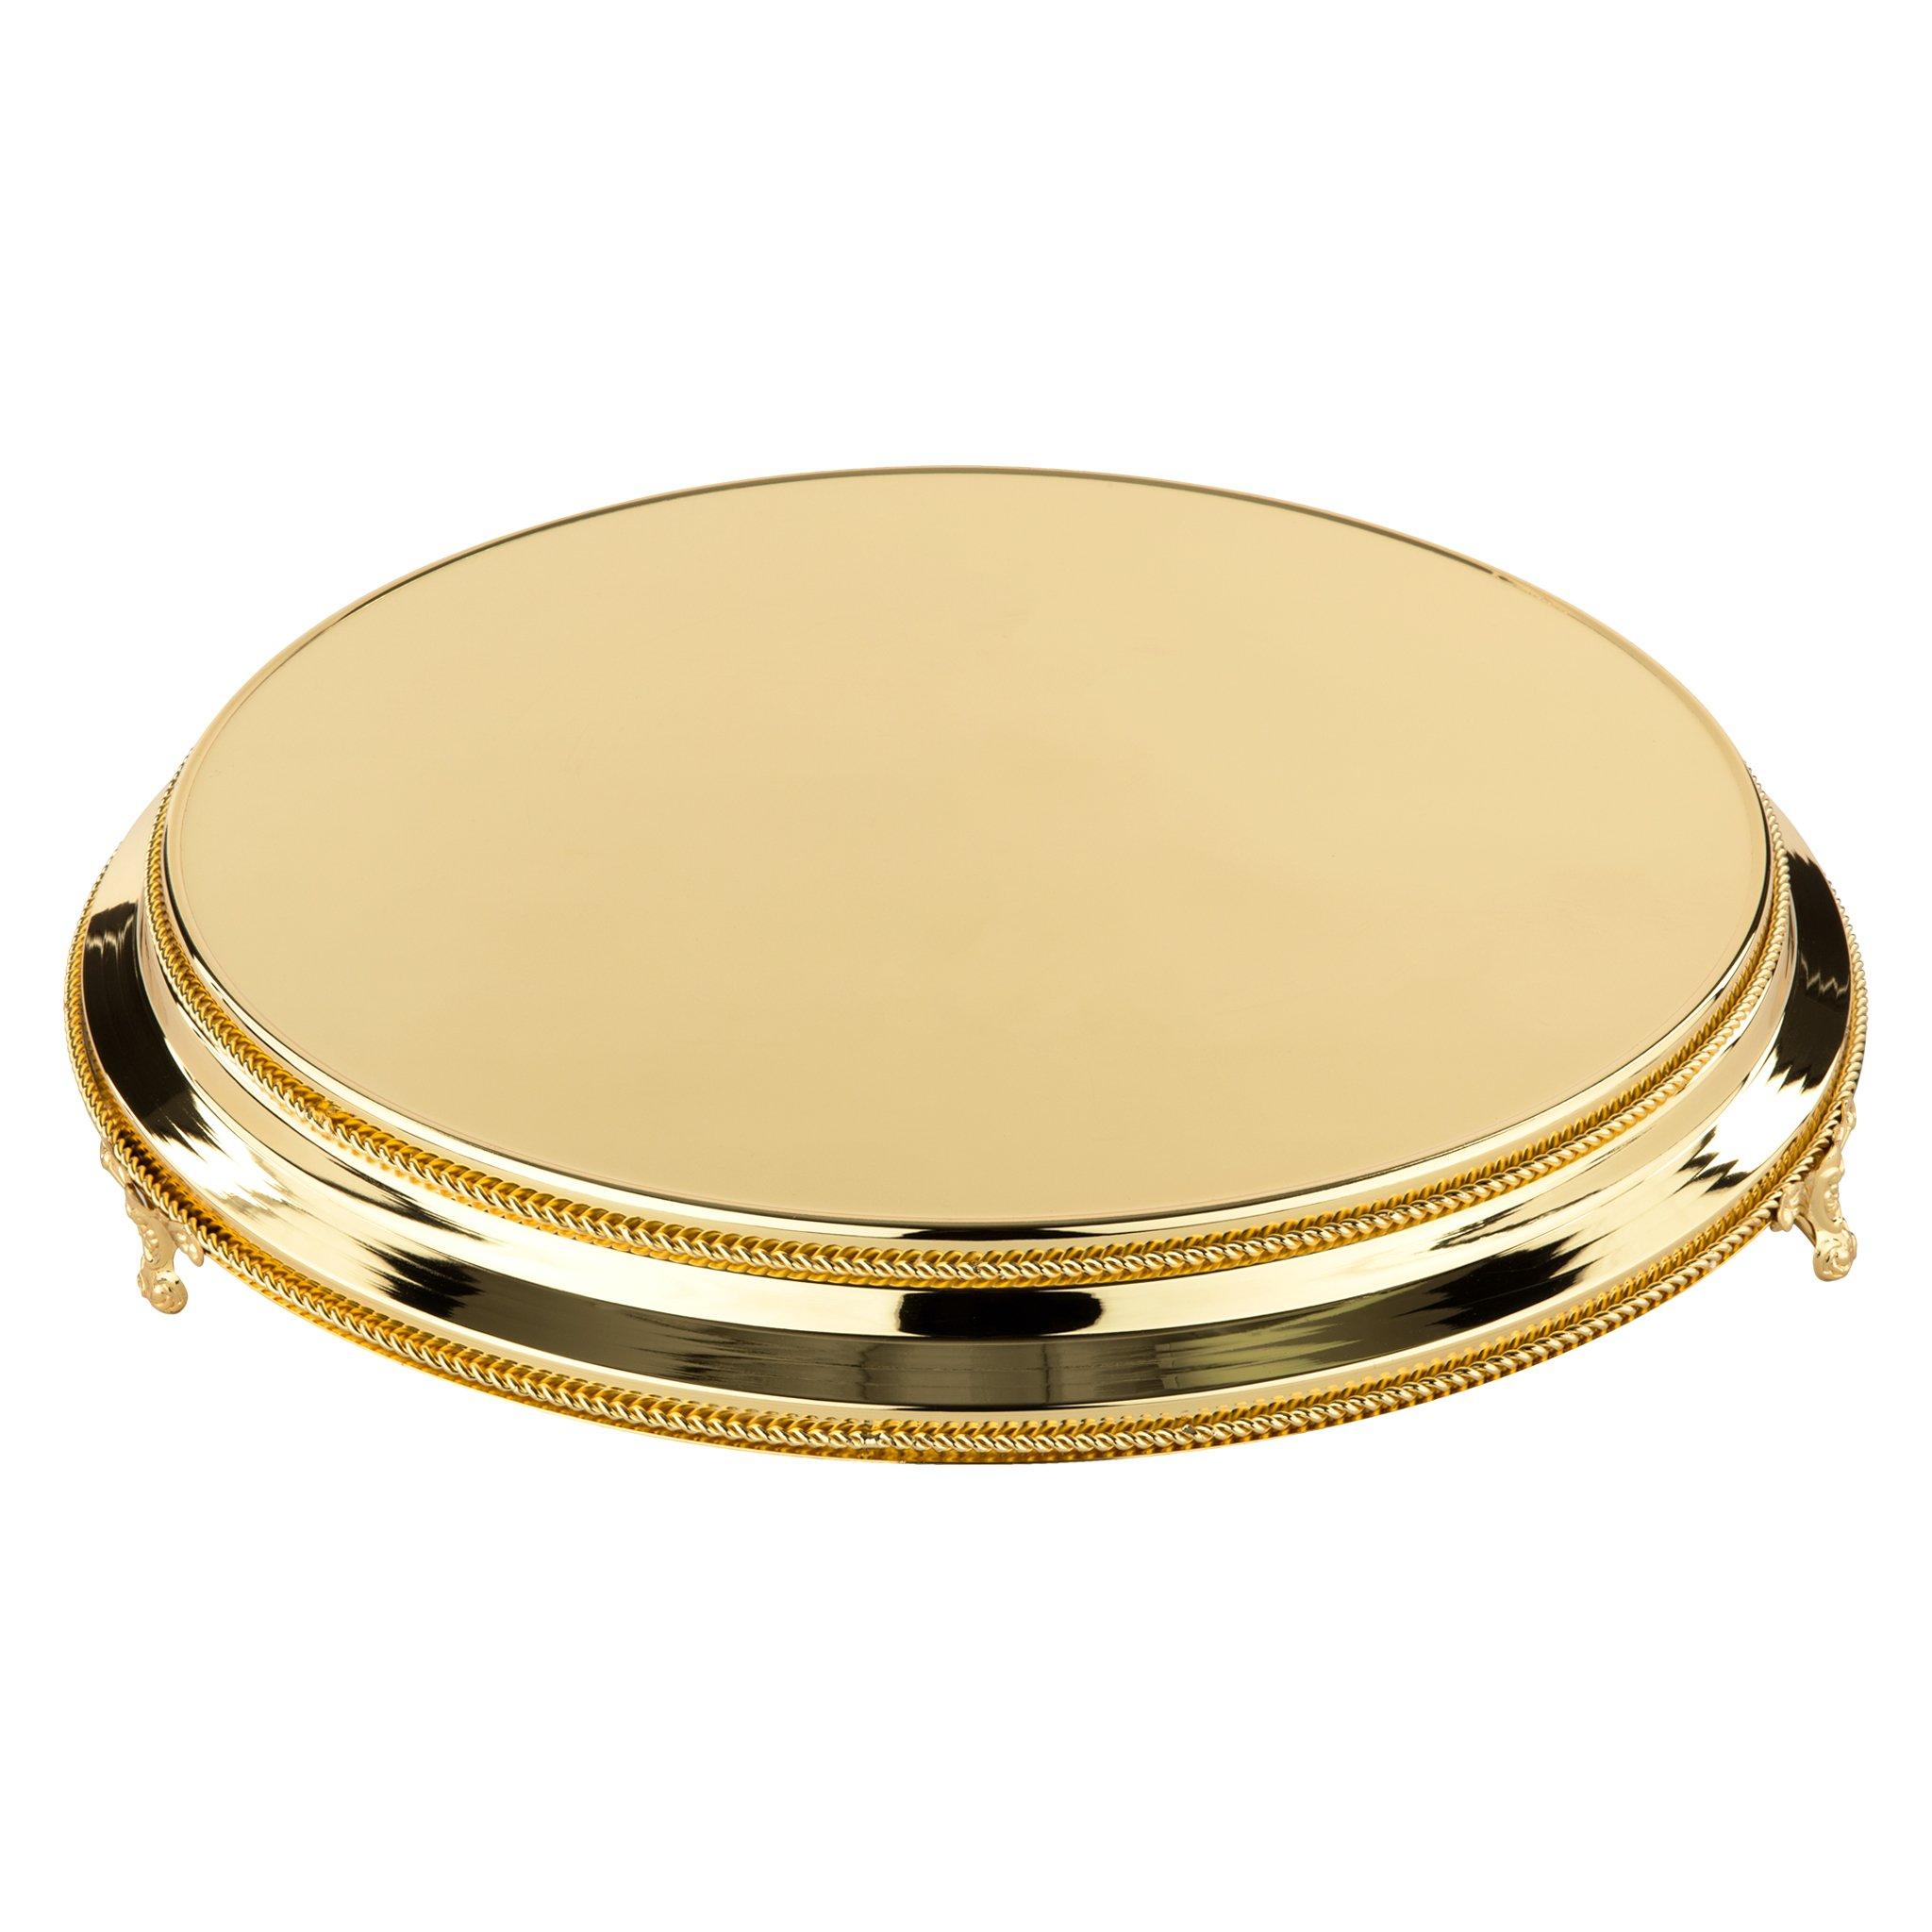 16 Inch Round Shiny Metallic Wedding Cake Stand Plateau (Gold)